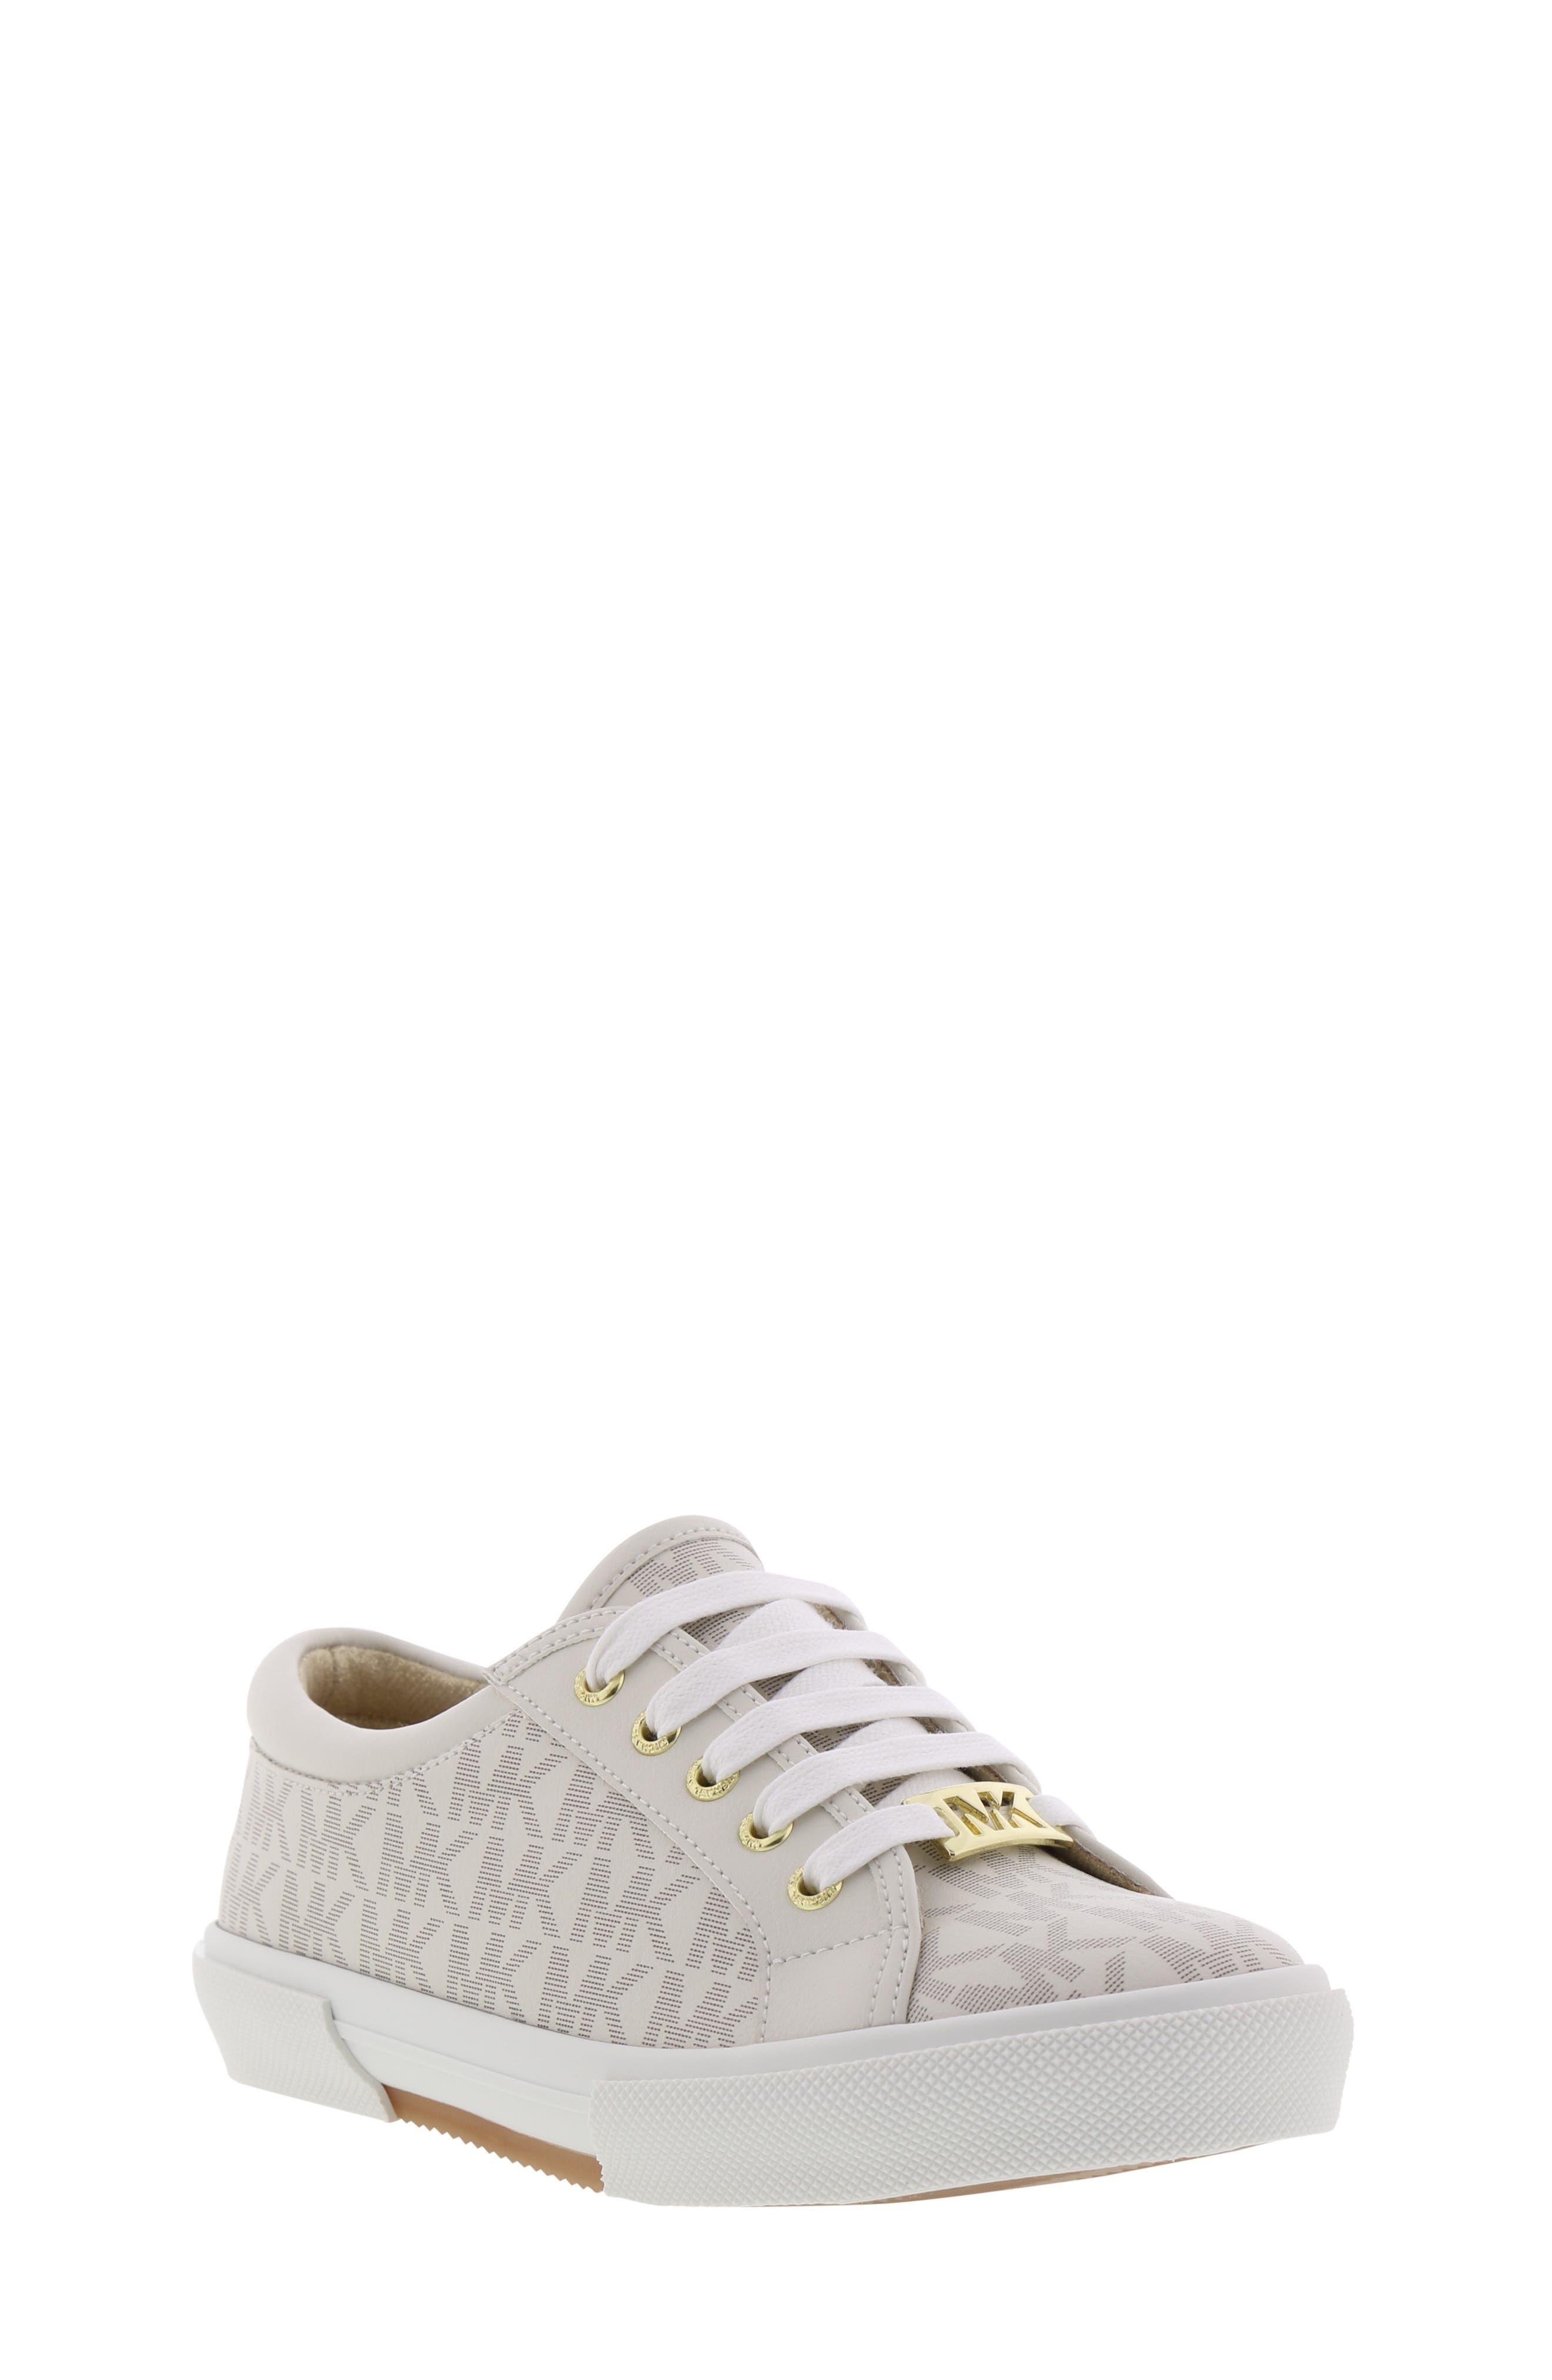 MICHAEL MICHAEL KORS,                             Ima Rebel Sneaker,                             Main thumbnail 1, color,                             VANILLA